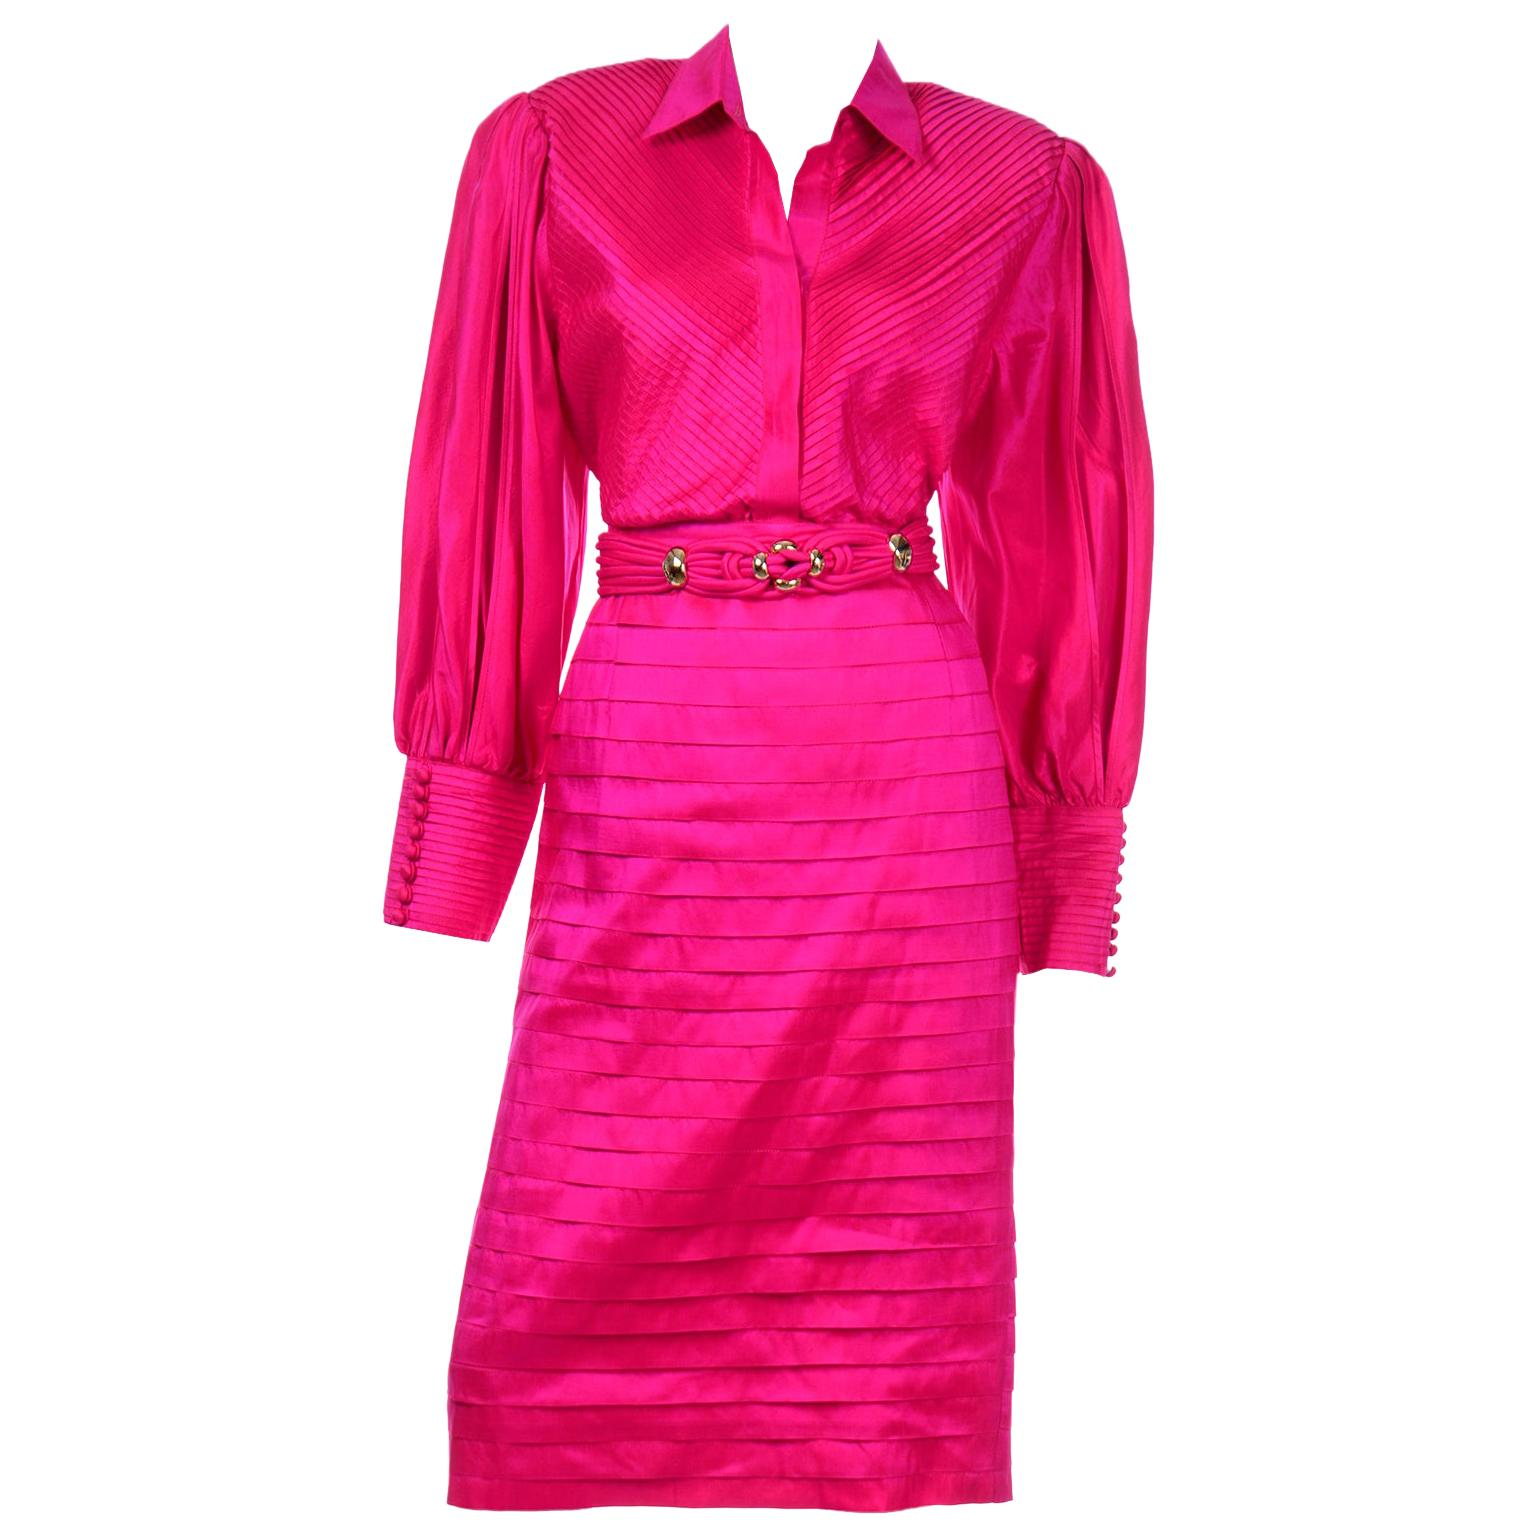 Vintage 1980s Pink Thai Silk  Pleated 2Pc Dress Statement Sleeve Blouse & Skirt